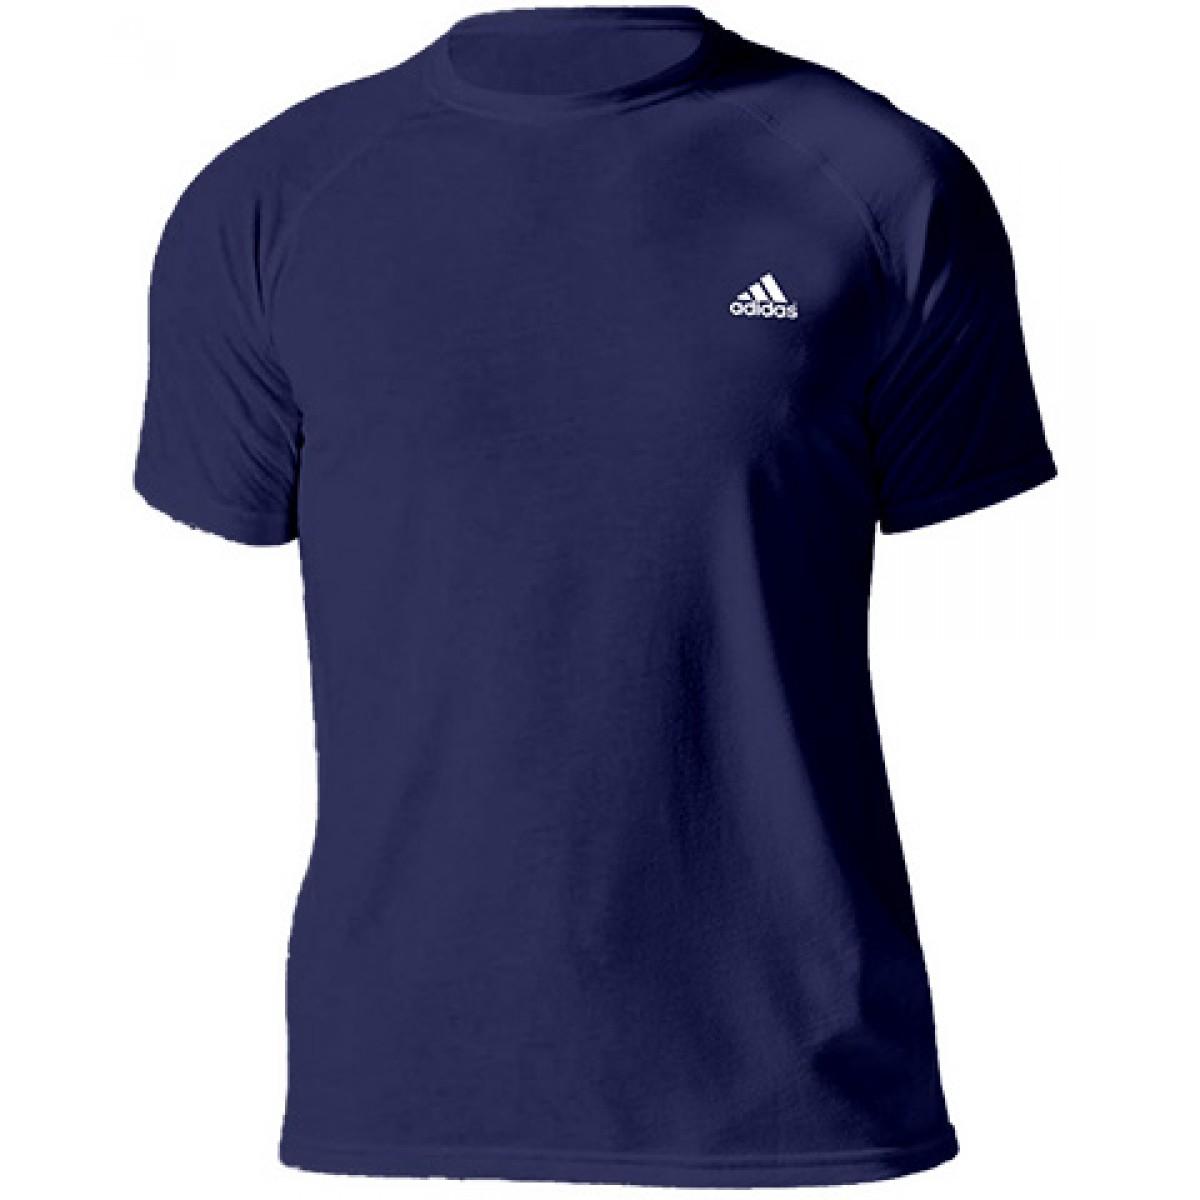 Adidas Embroidered Logo Essential Crew Neck T-shirt